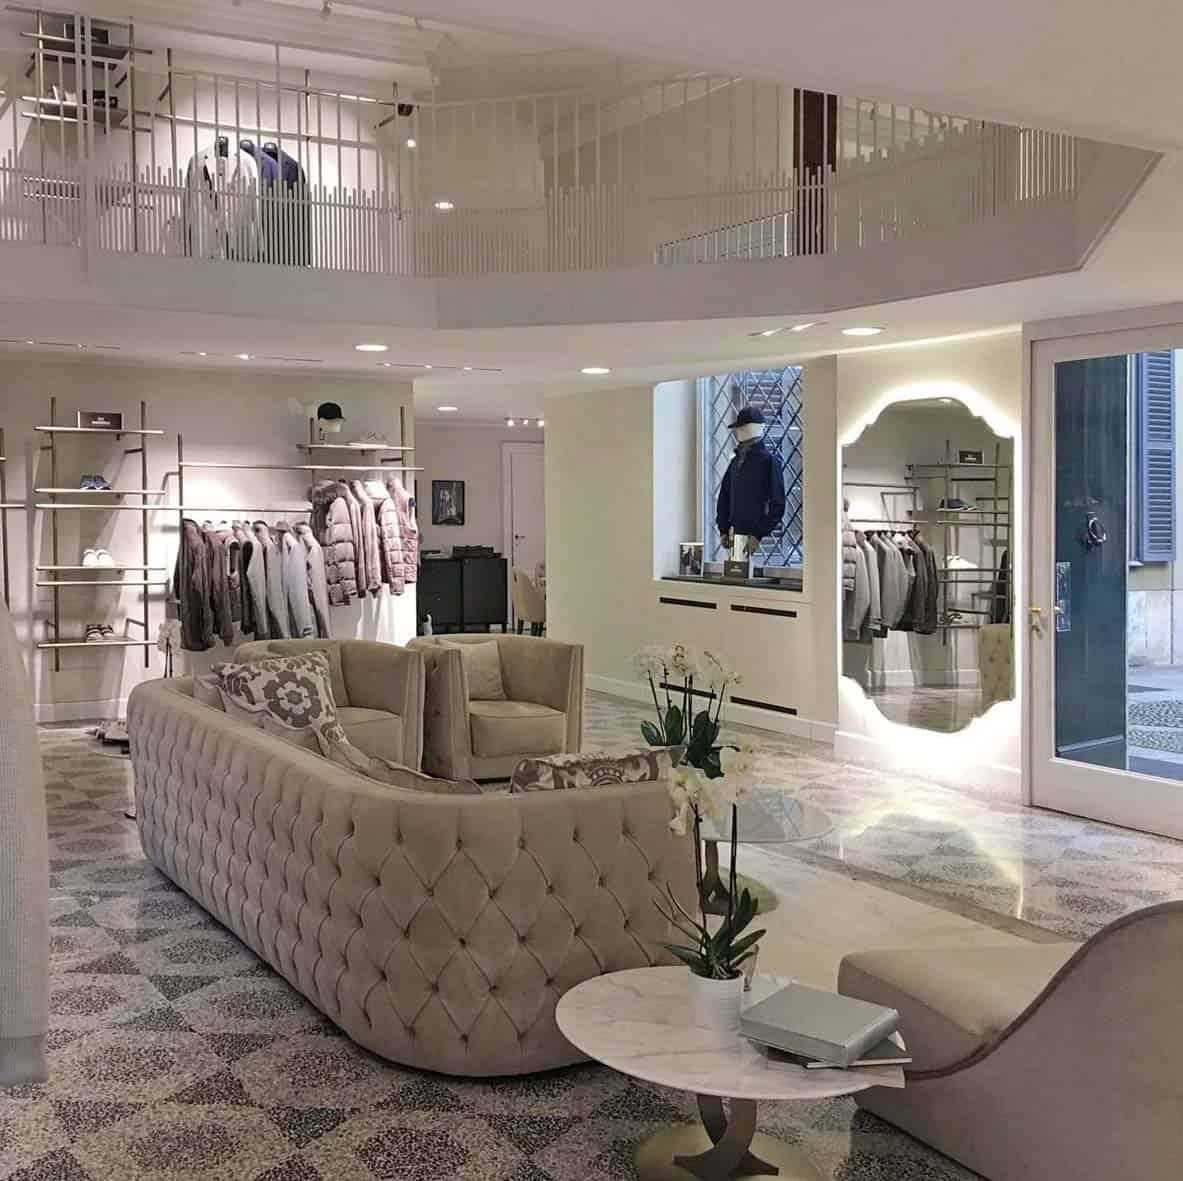 Mandelli showroom